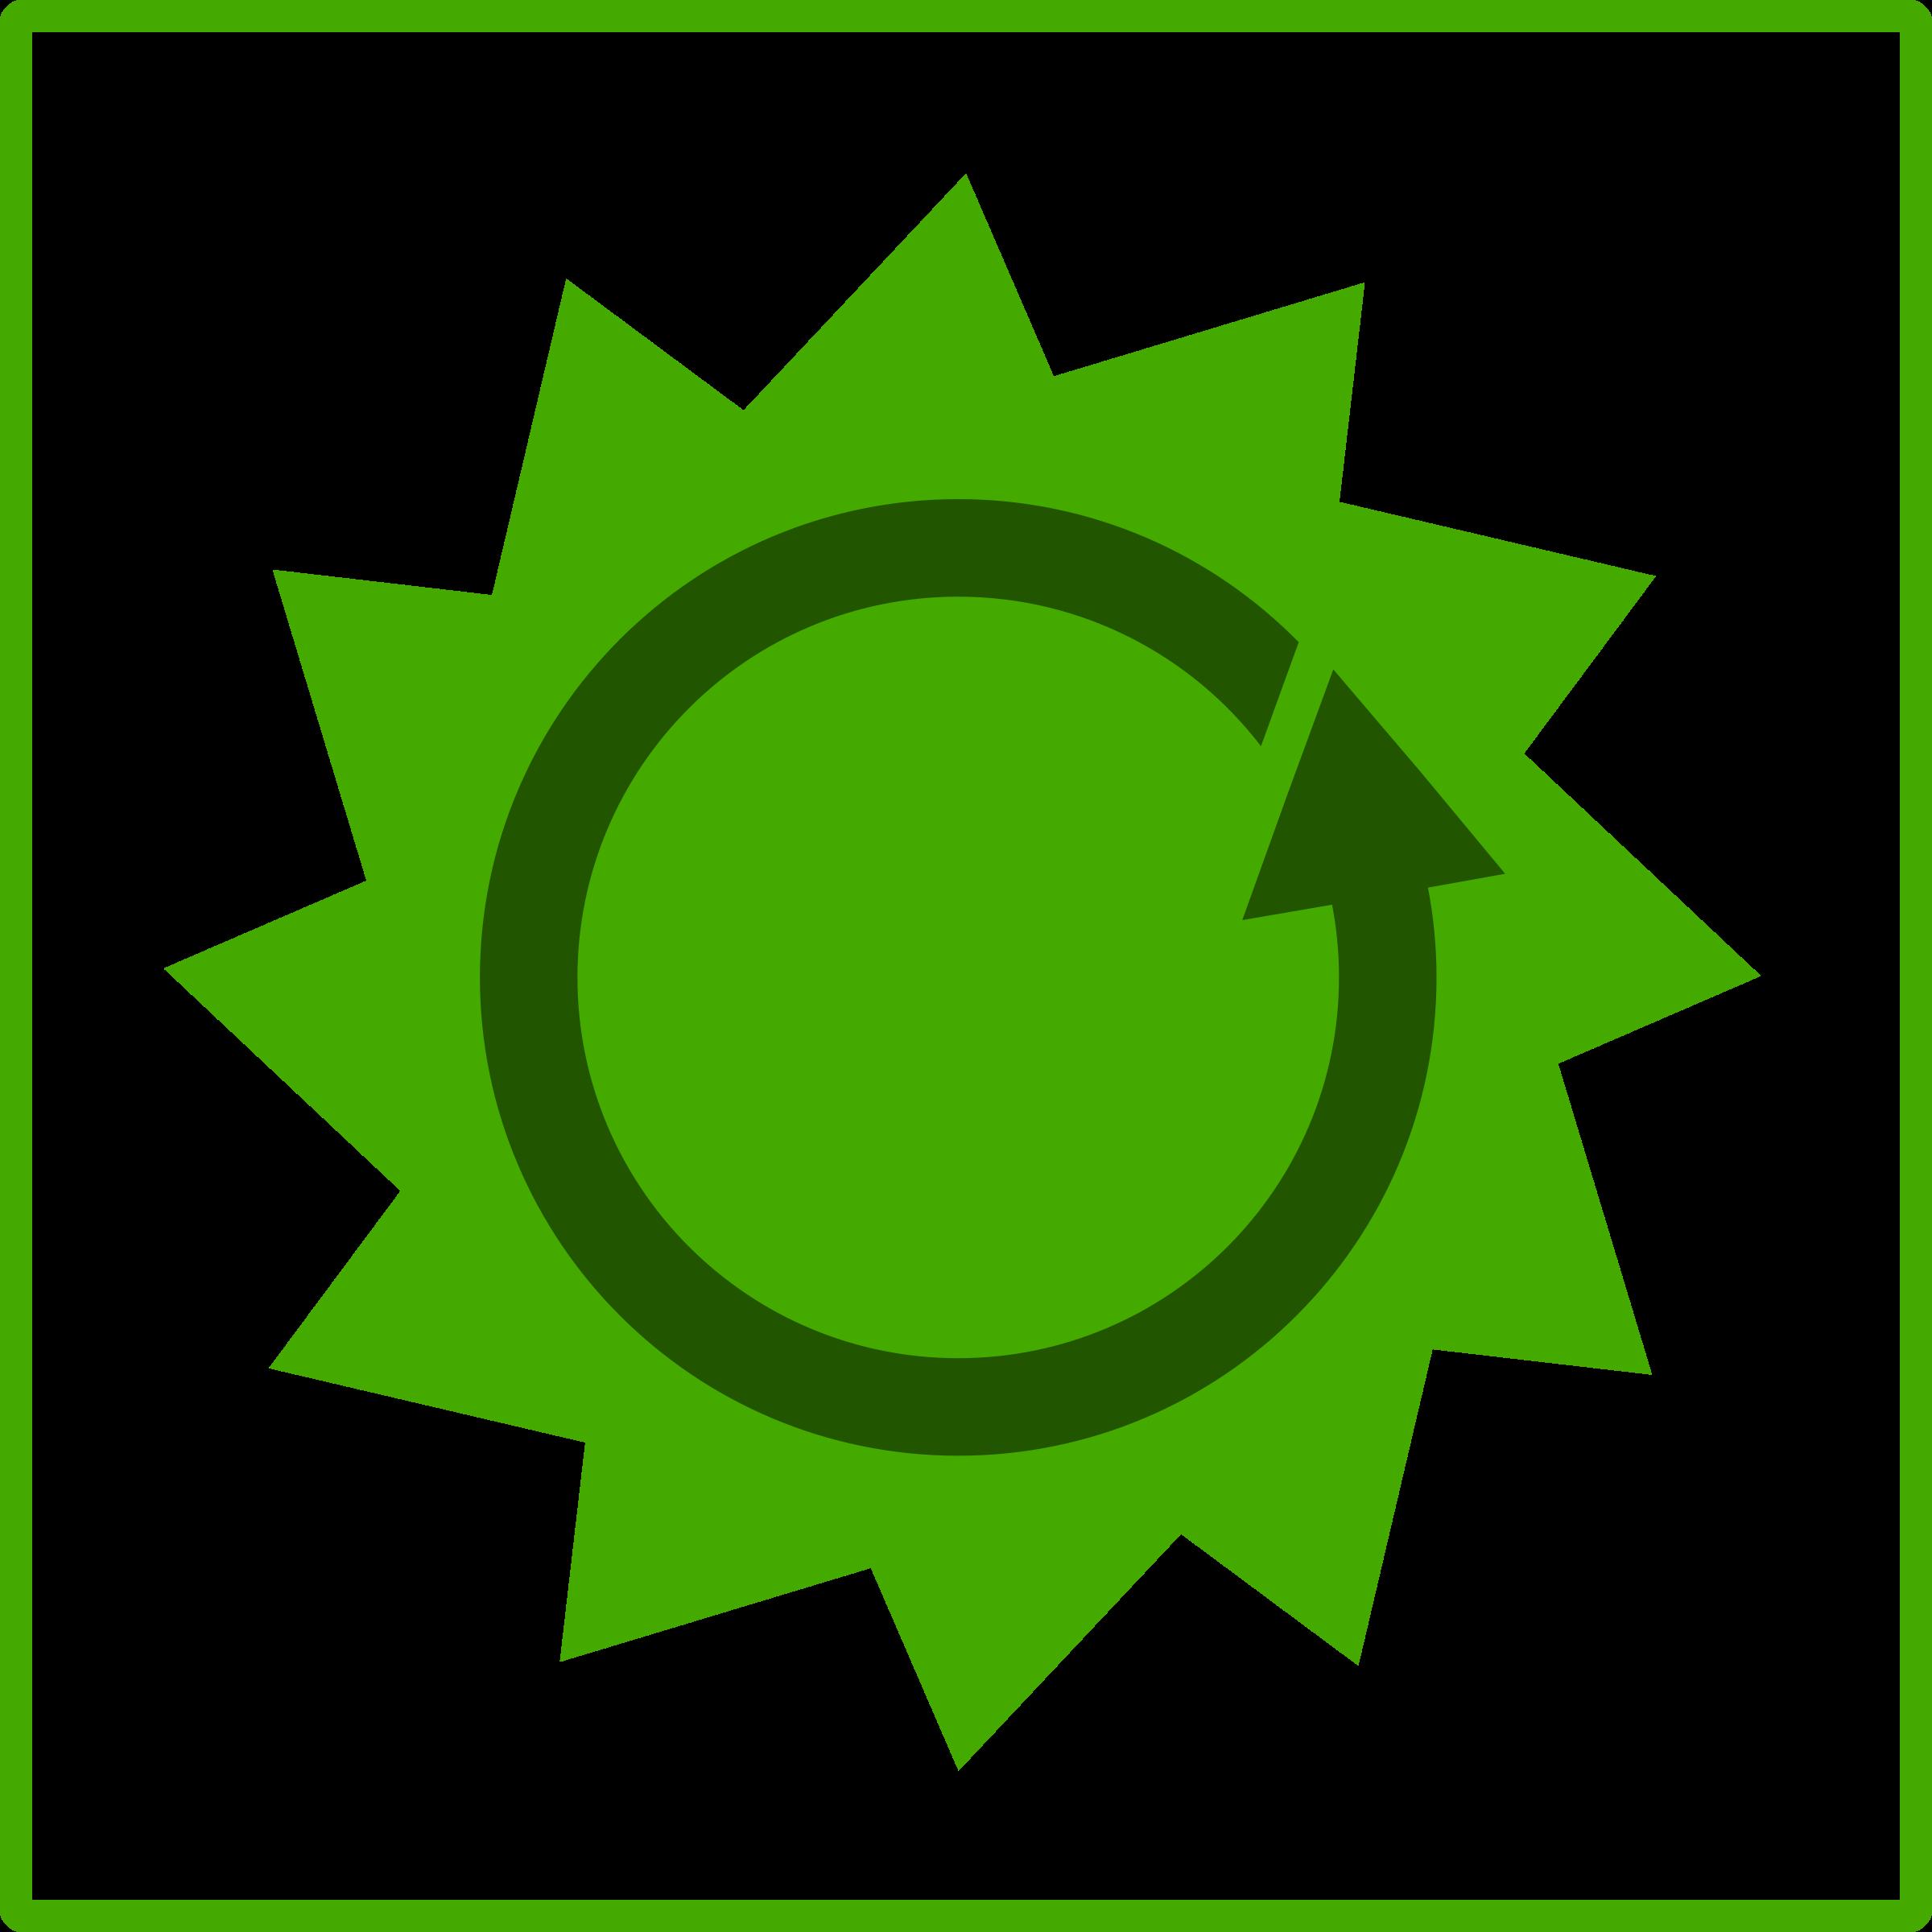 Energy clipart icon. Eco green big image